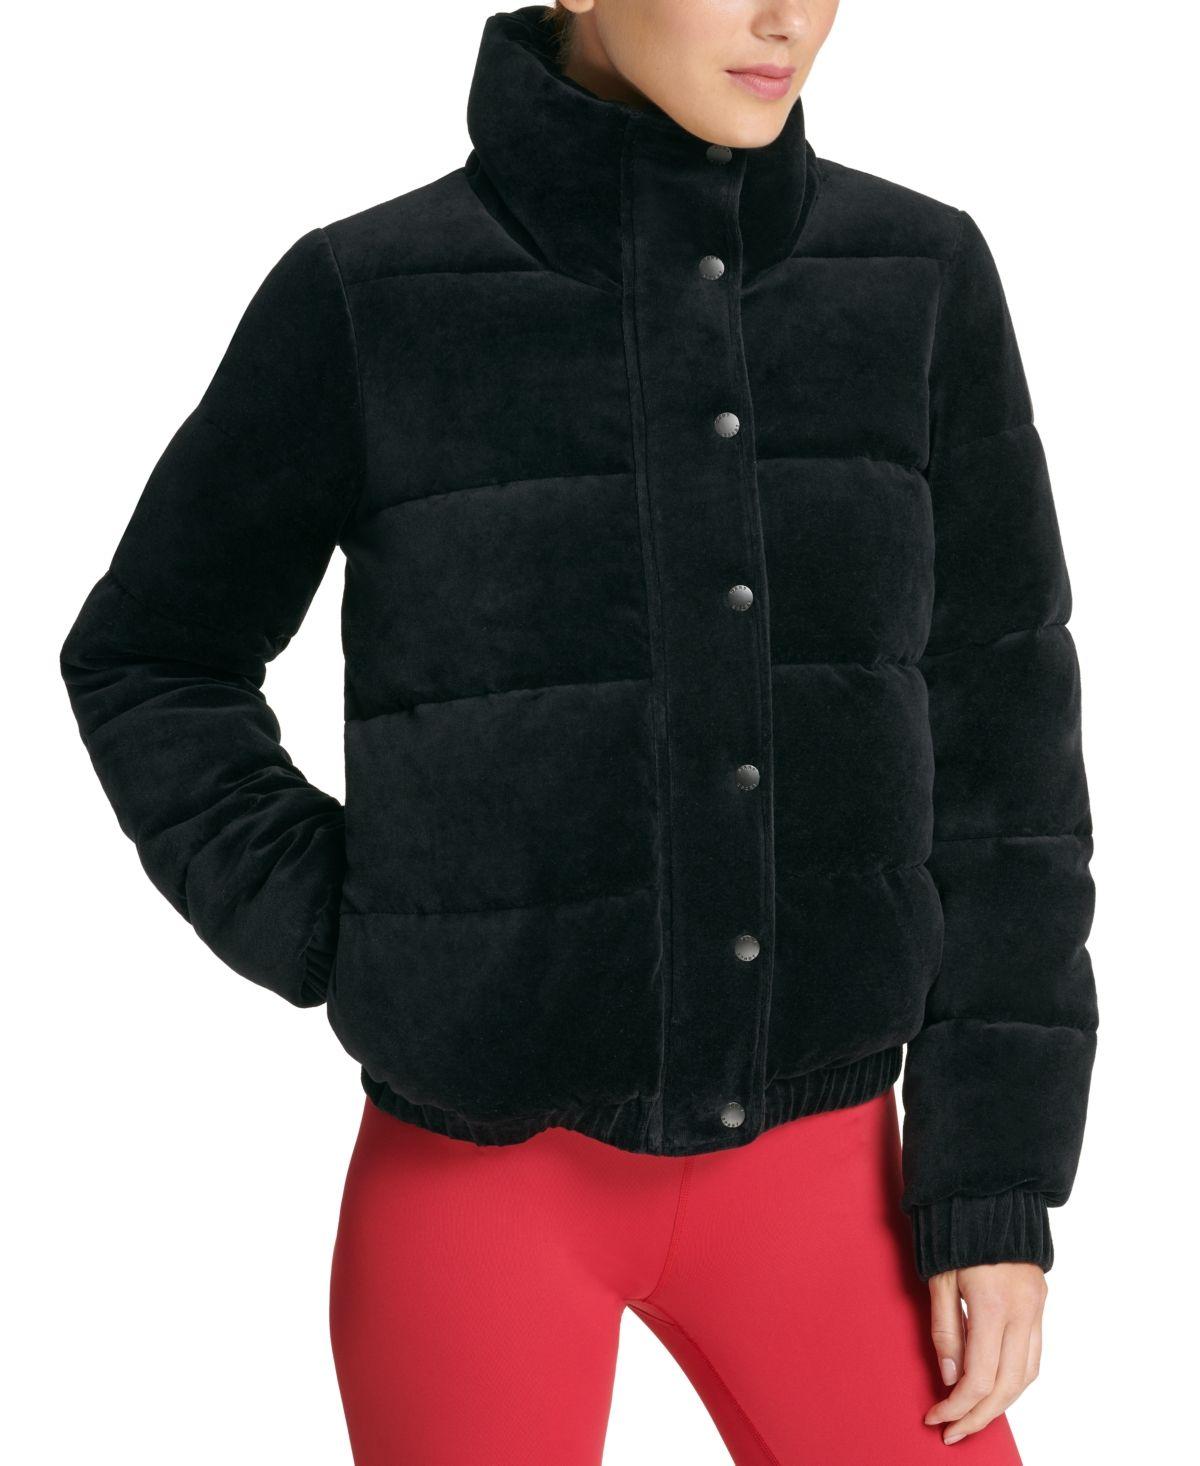 Dkny Sport Velour Puffer Jacket [ 1466 x 1200 Pixel ]